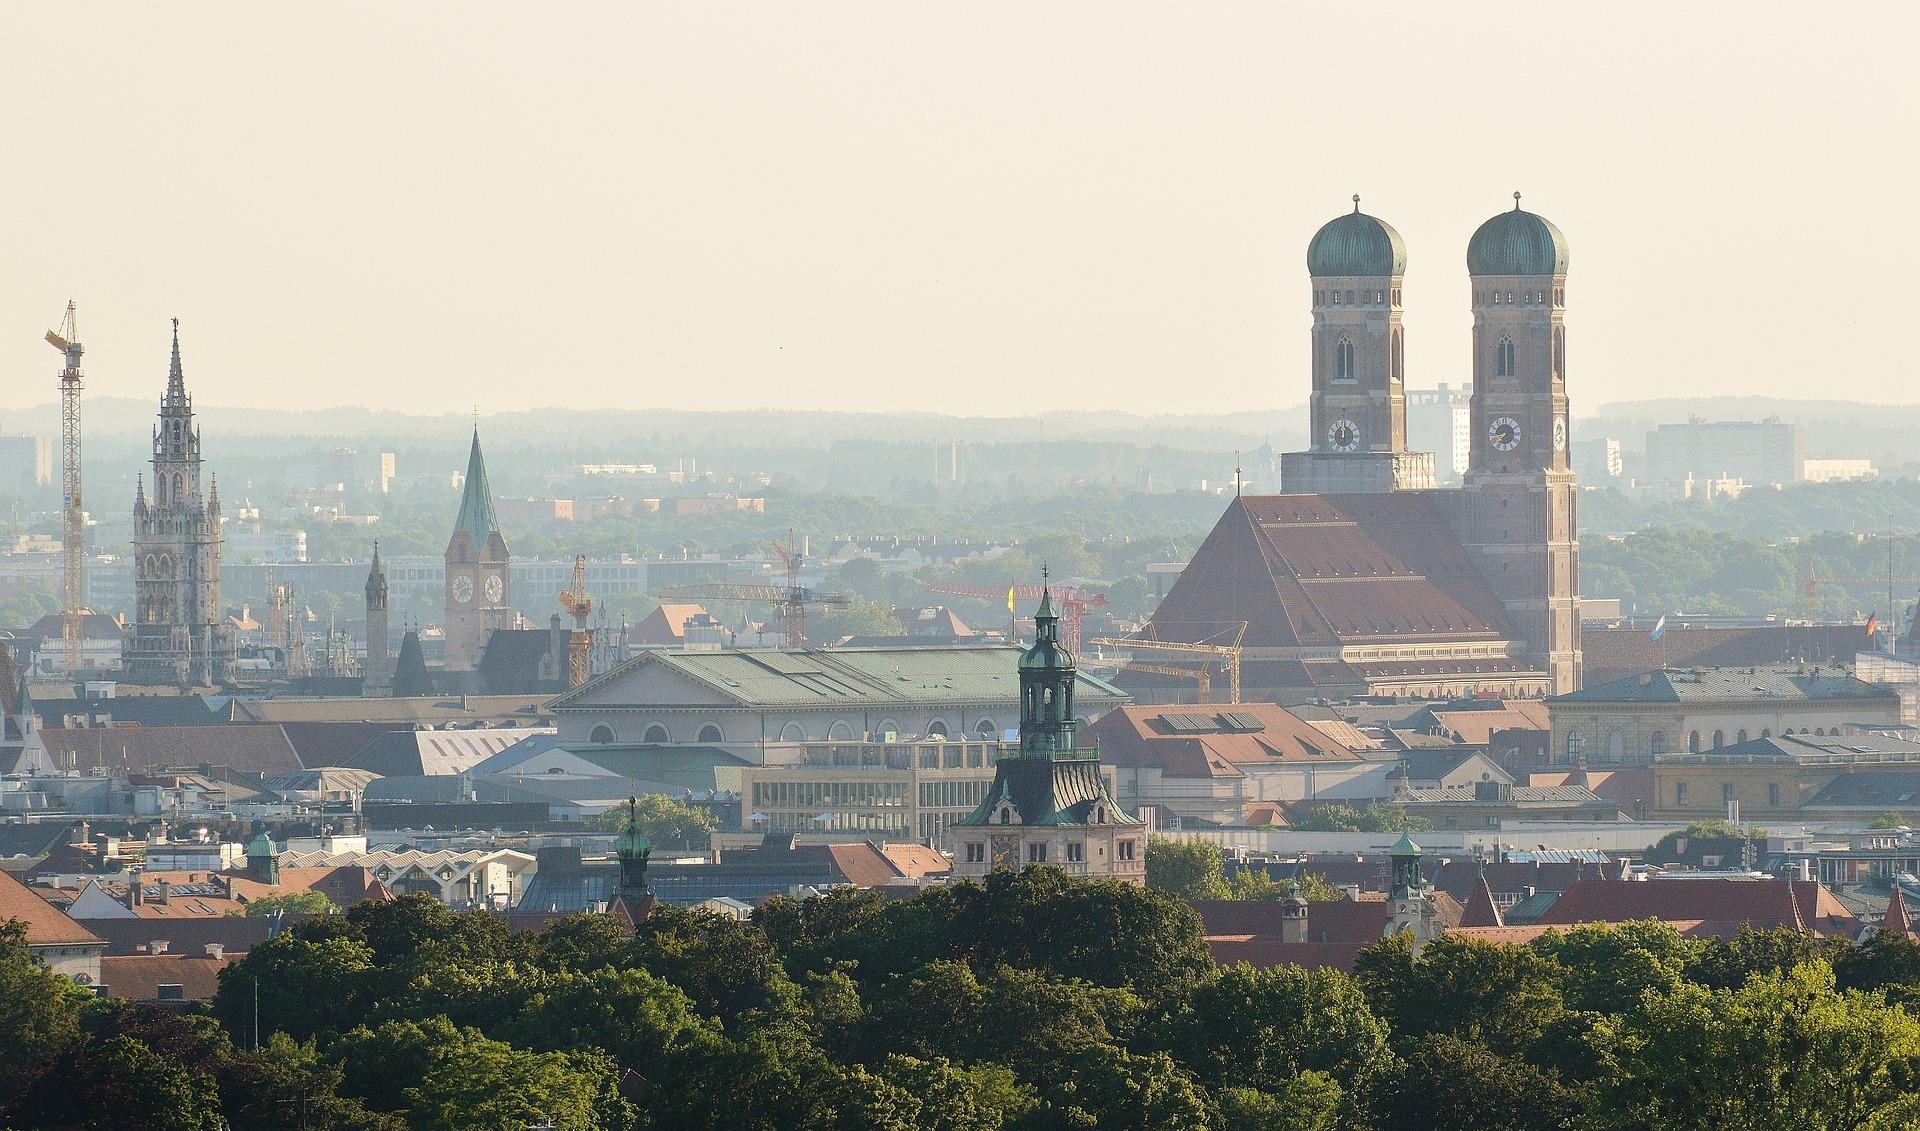 Munich, Germany skyline